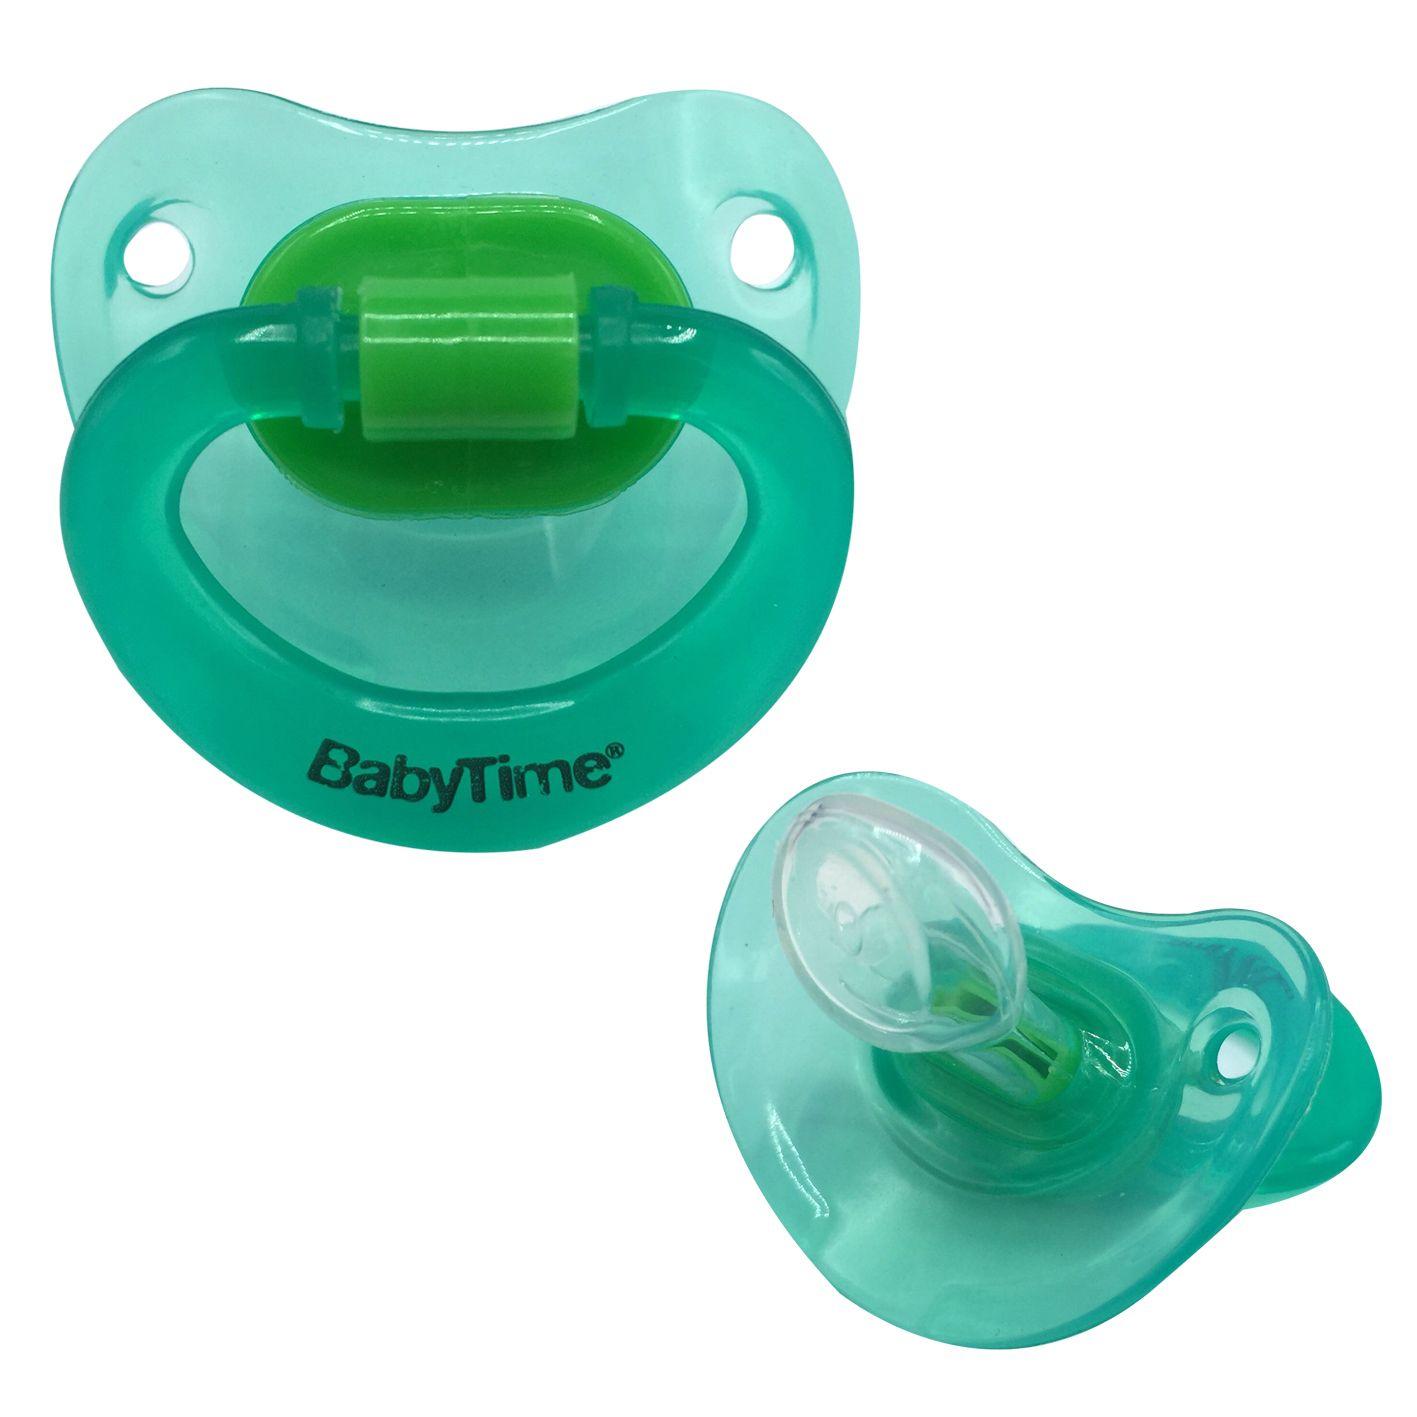 BabyTime BT120 Silikon Damaklı Emzik No 2 - Yeşil